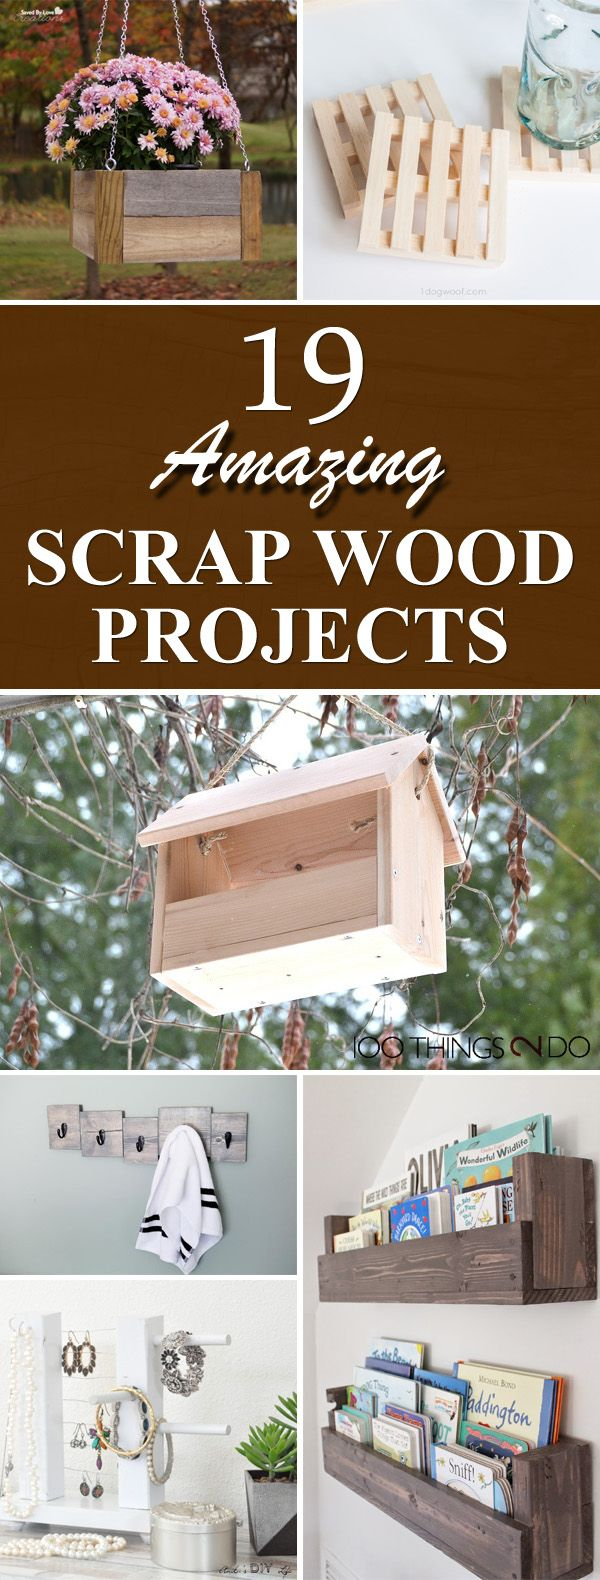 19 Amazing DIY Scrap Wood Projects